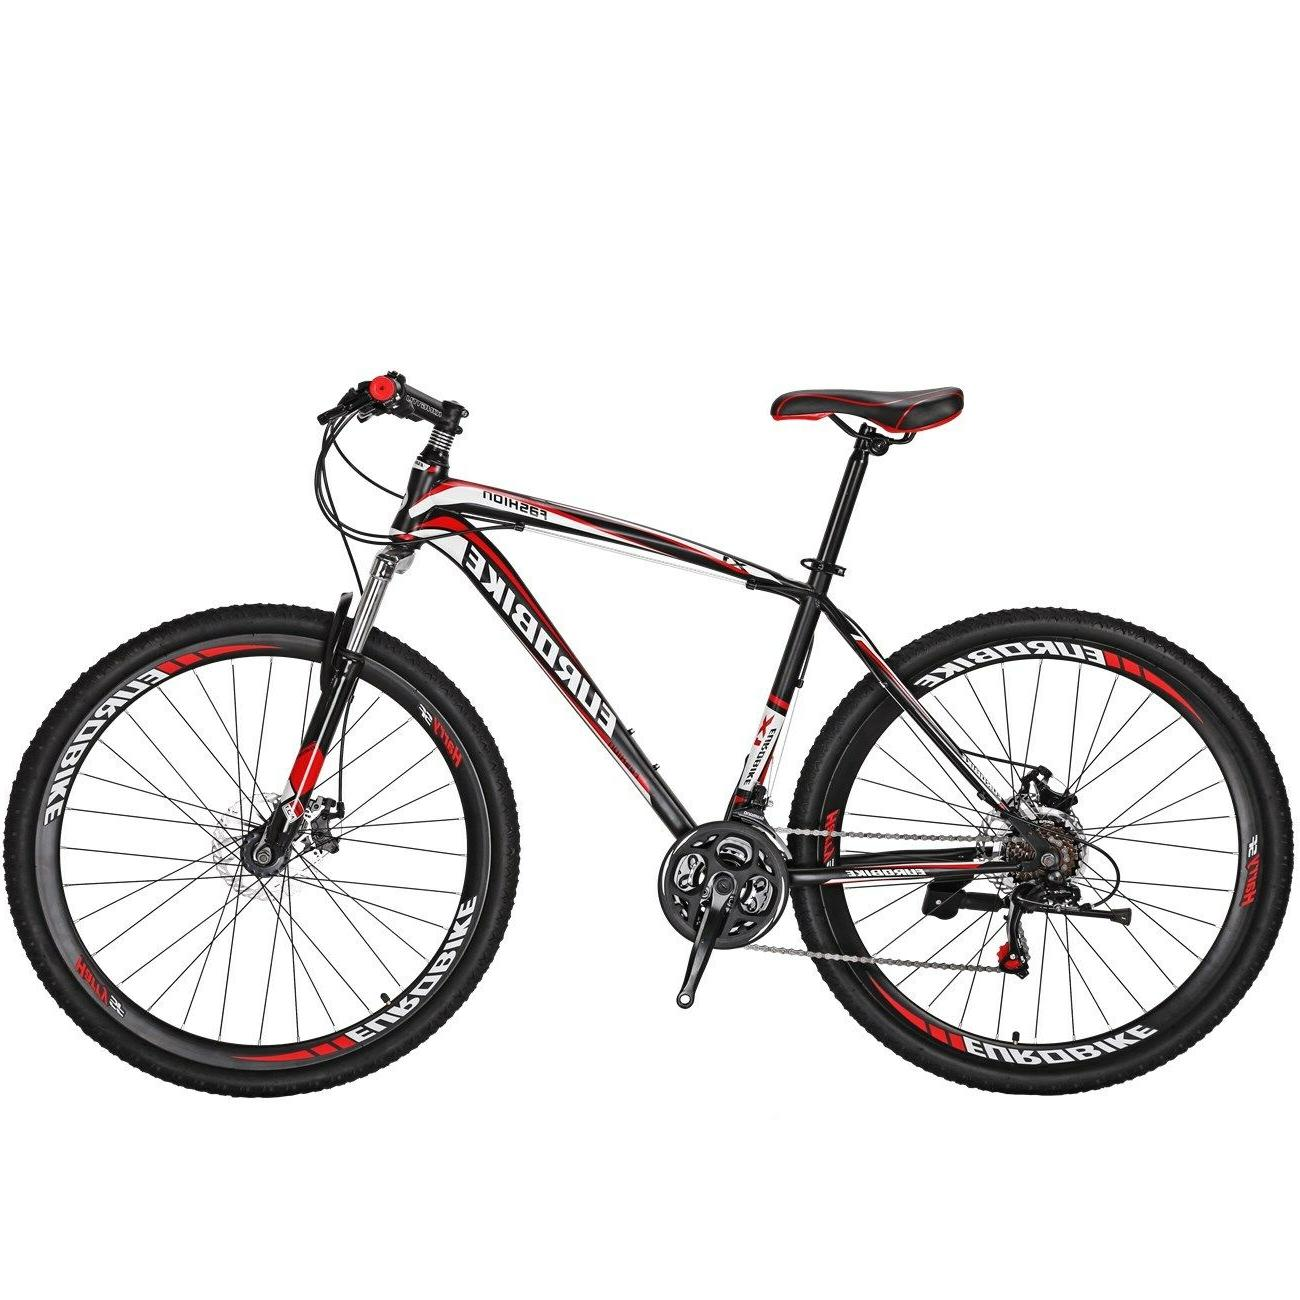 full suspension folding mountain bike 26 bikes